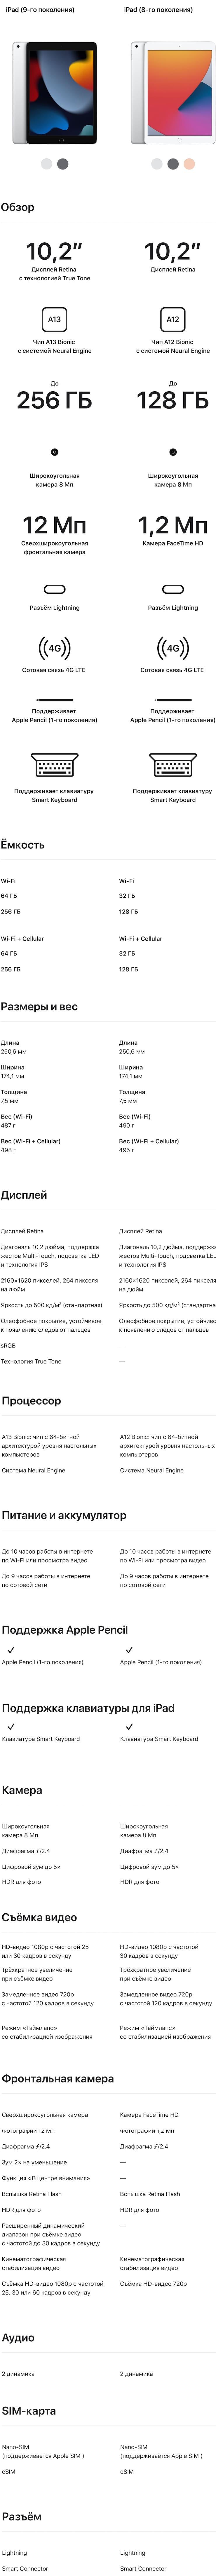 Подробное сравнение технических характеристик iPad 8 (2020) и iPad (2021)